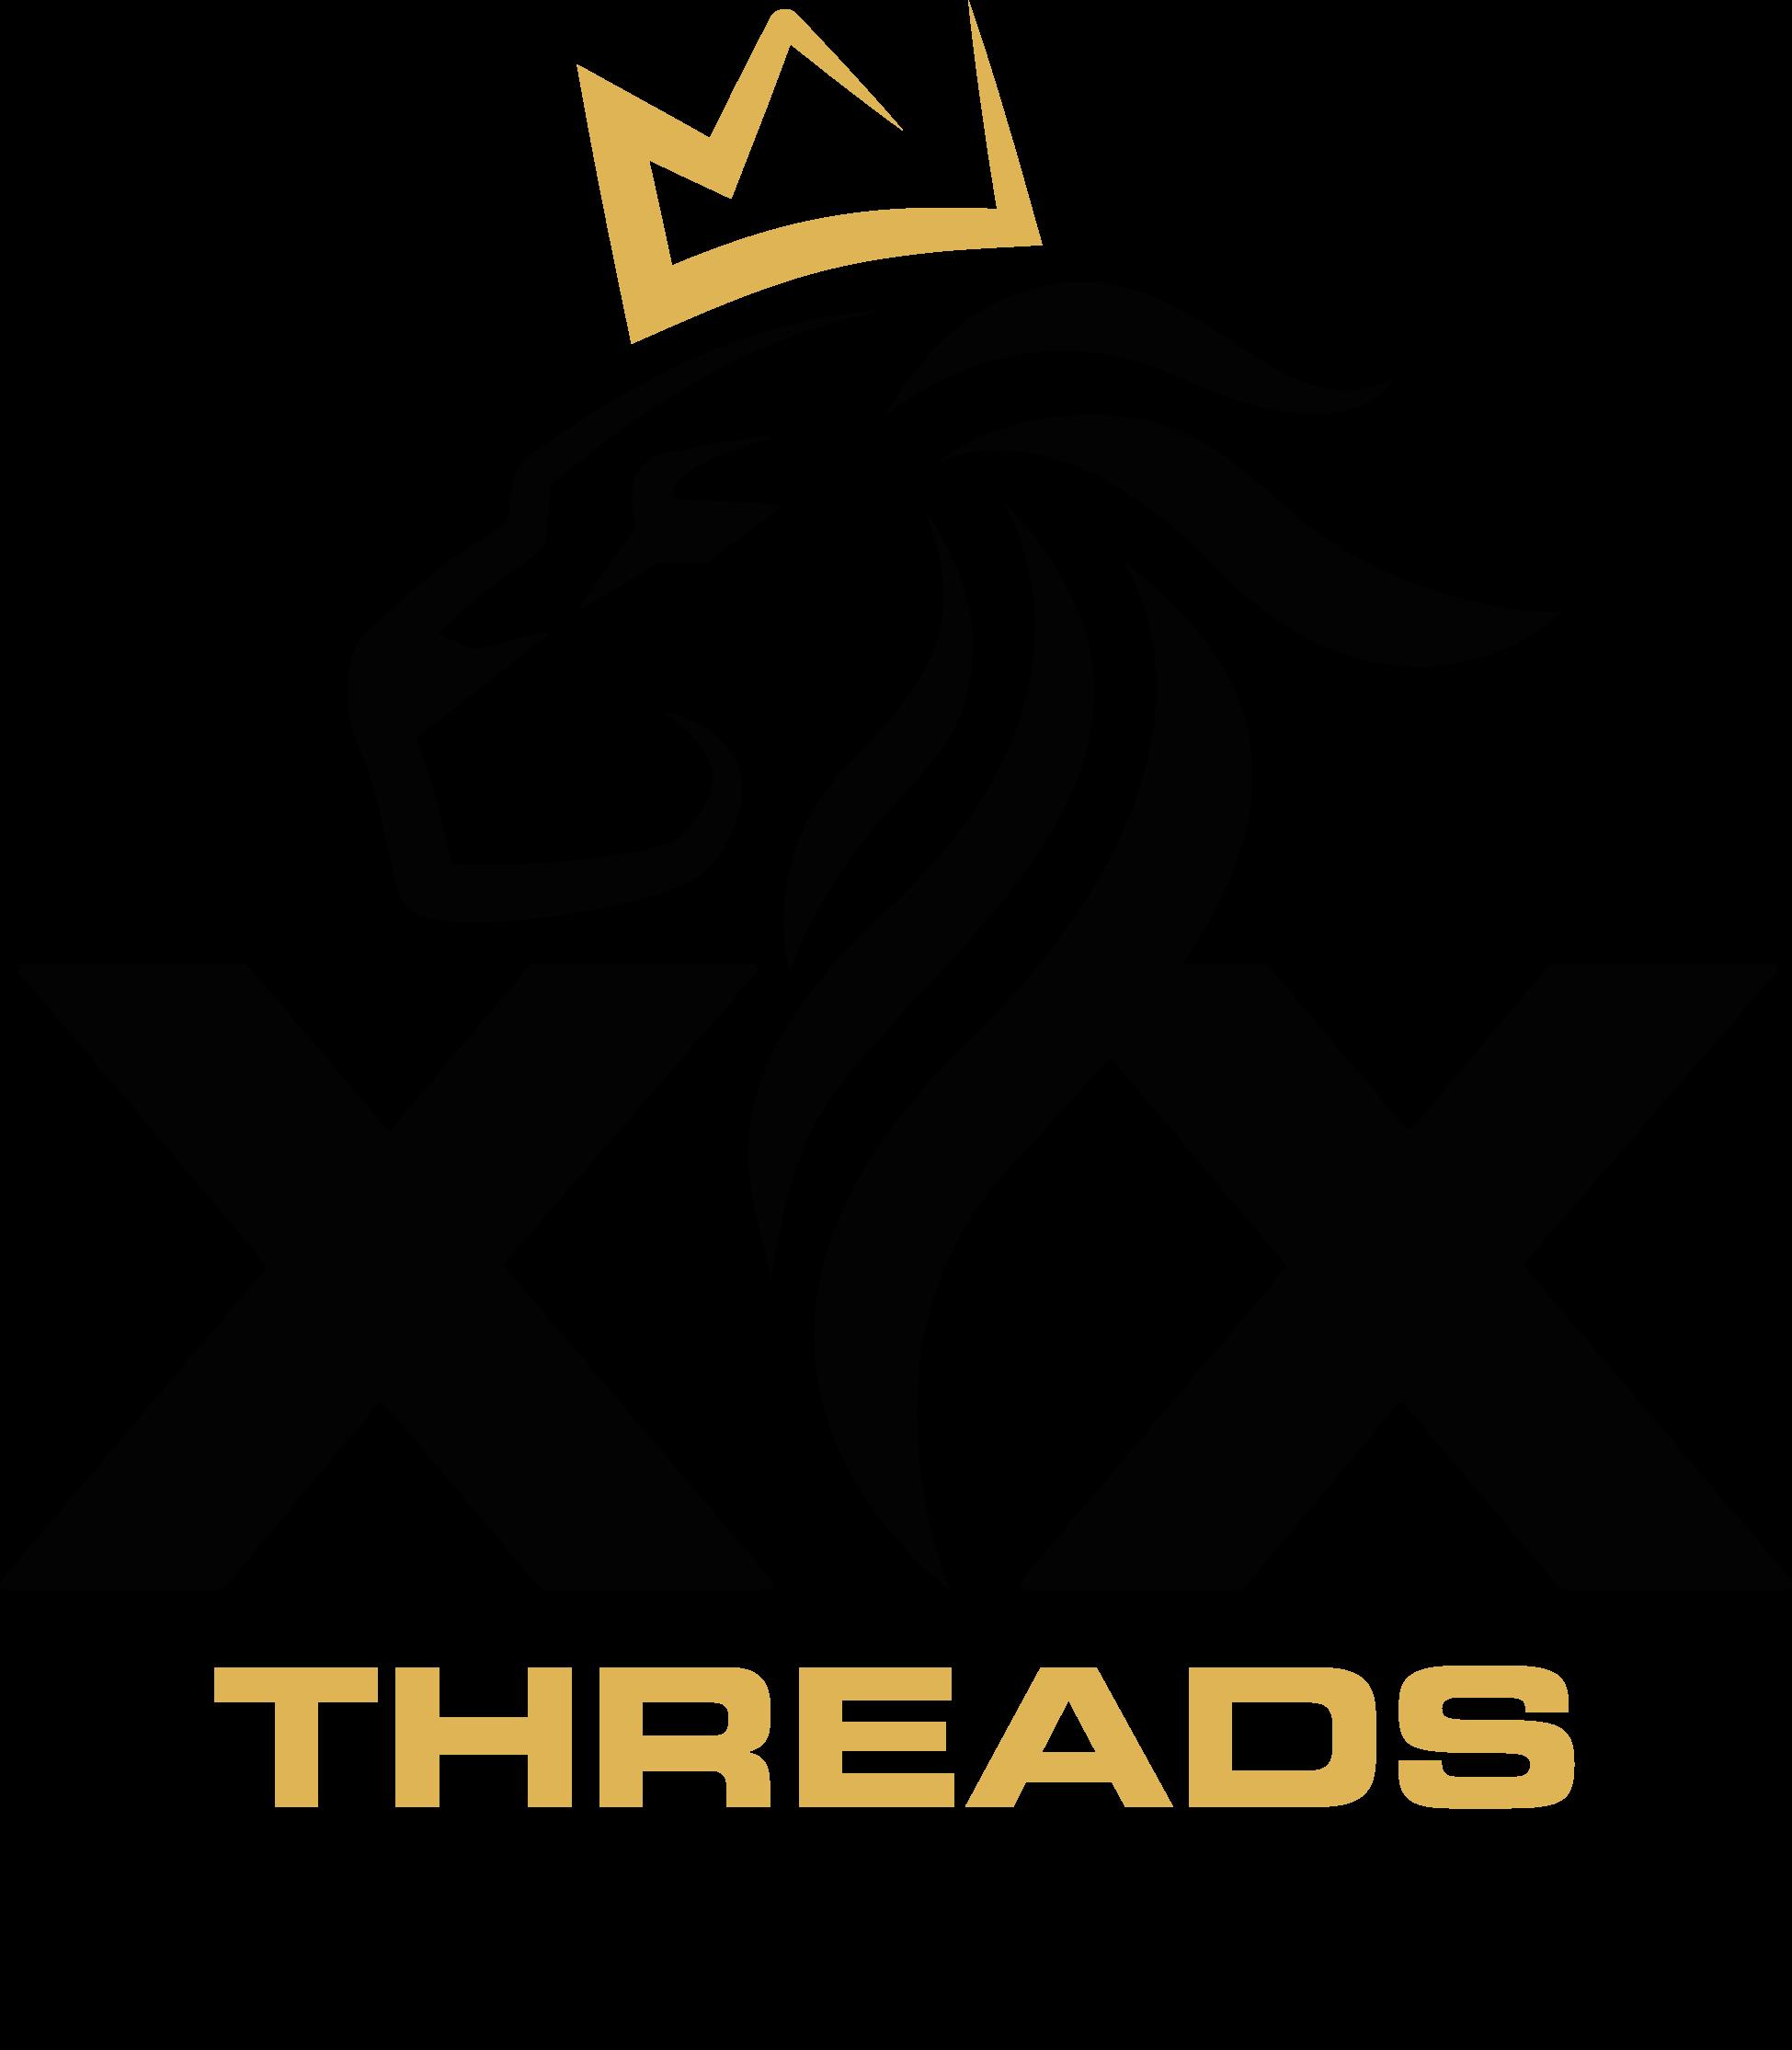 https://xxthreads.com/wp-content/uploads/2021/01/cropped-Logo-XX-Threads.png